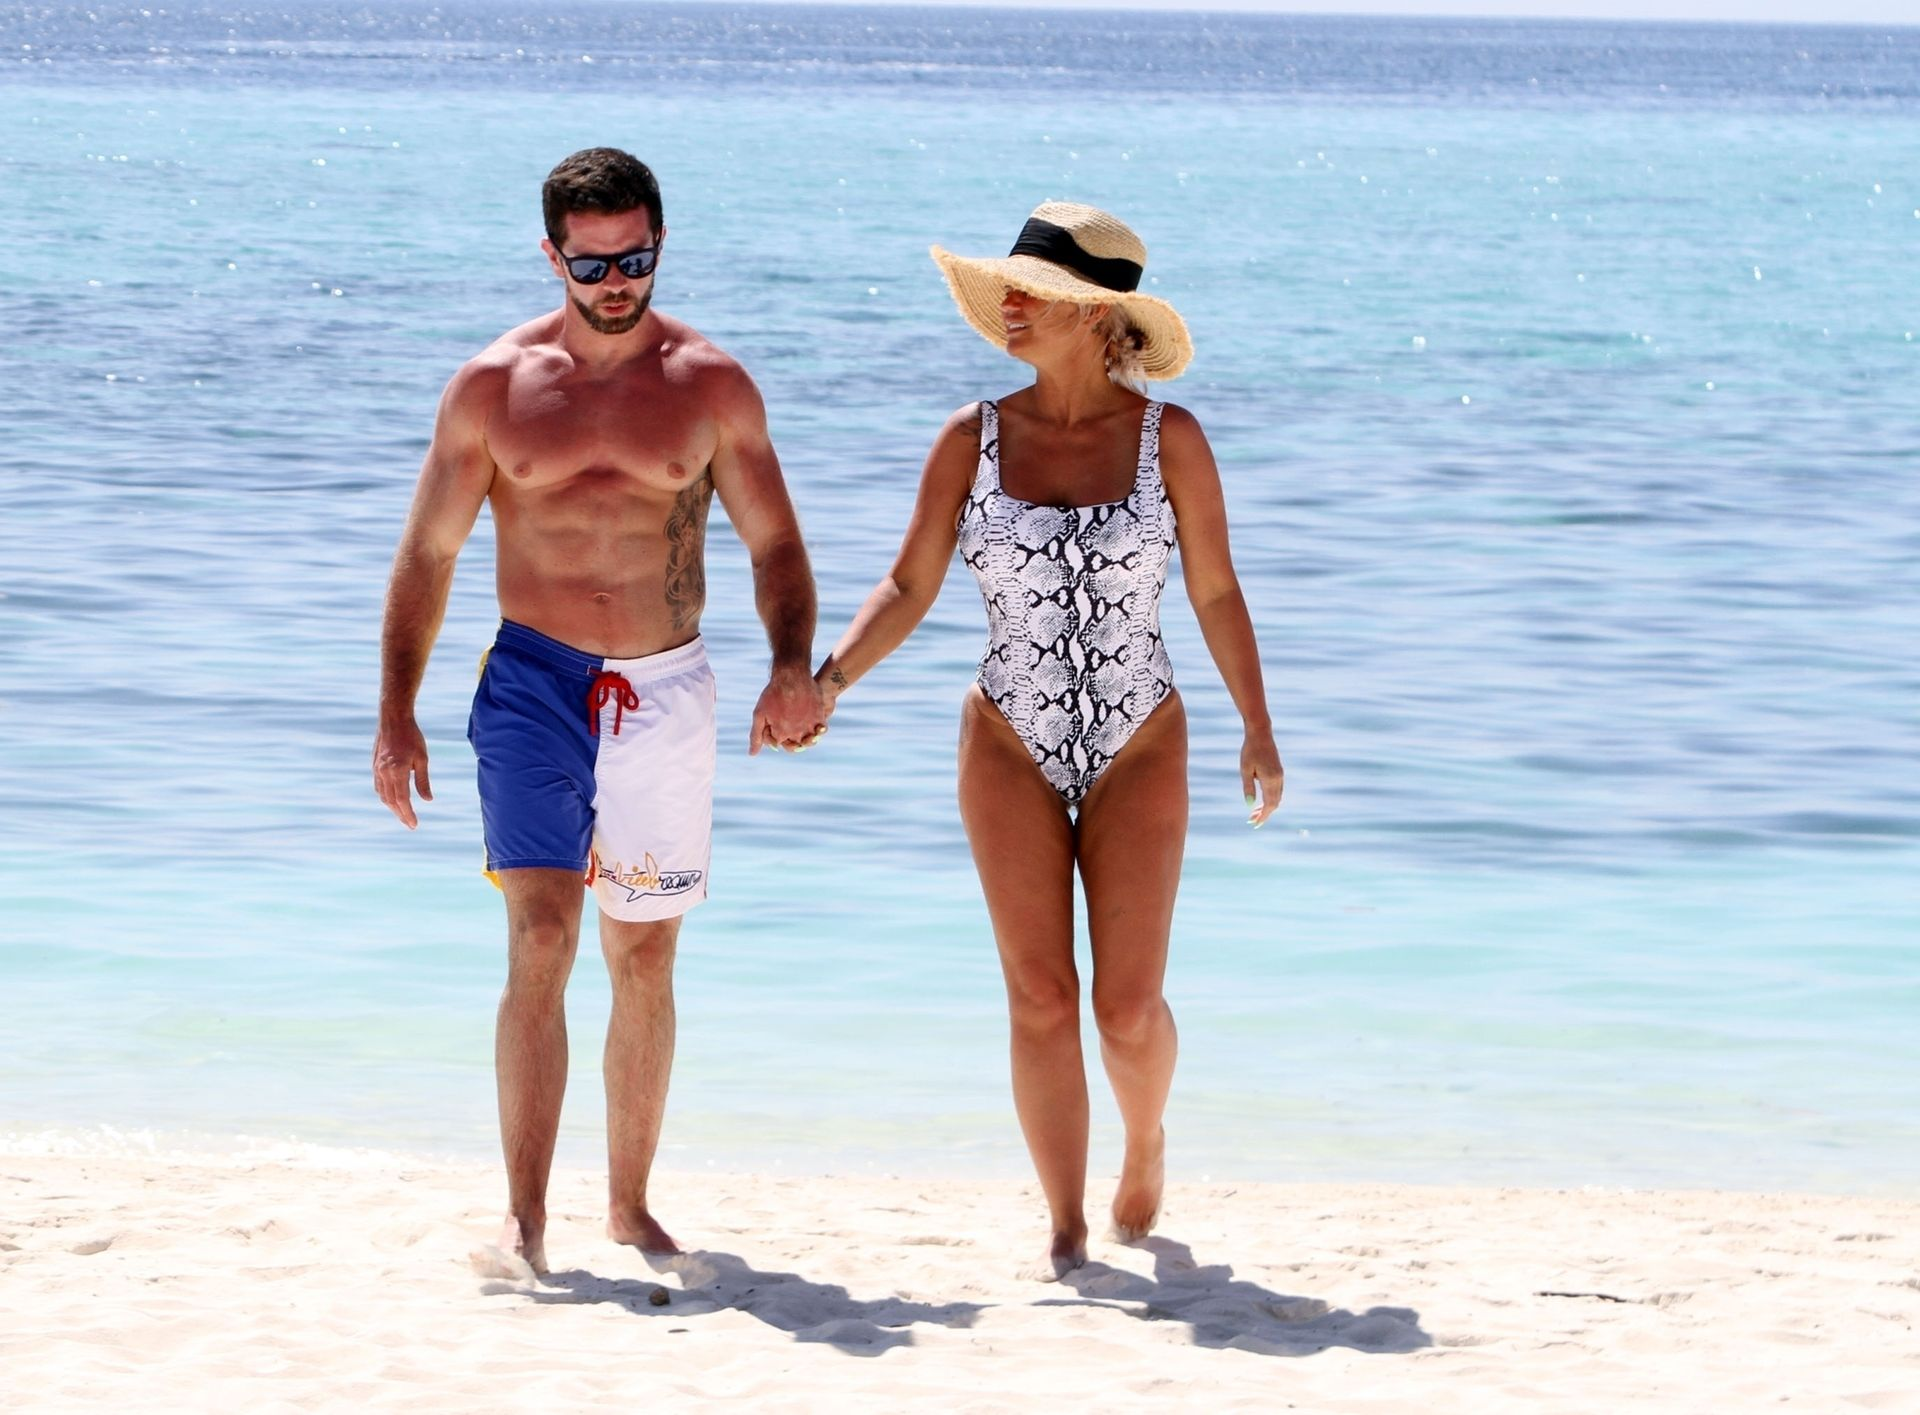 Kerry Katona & Ryan Mahoney Hit The Beach On Holiday At Their Luxury 5 Star Resort Ayada Maldives 0009